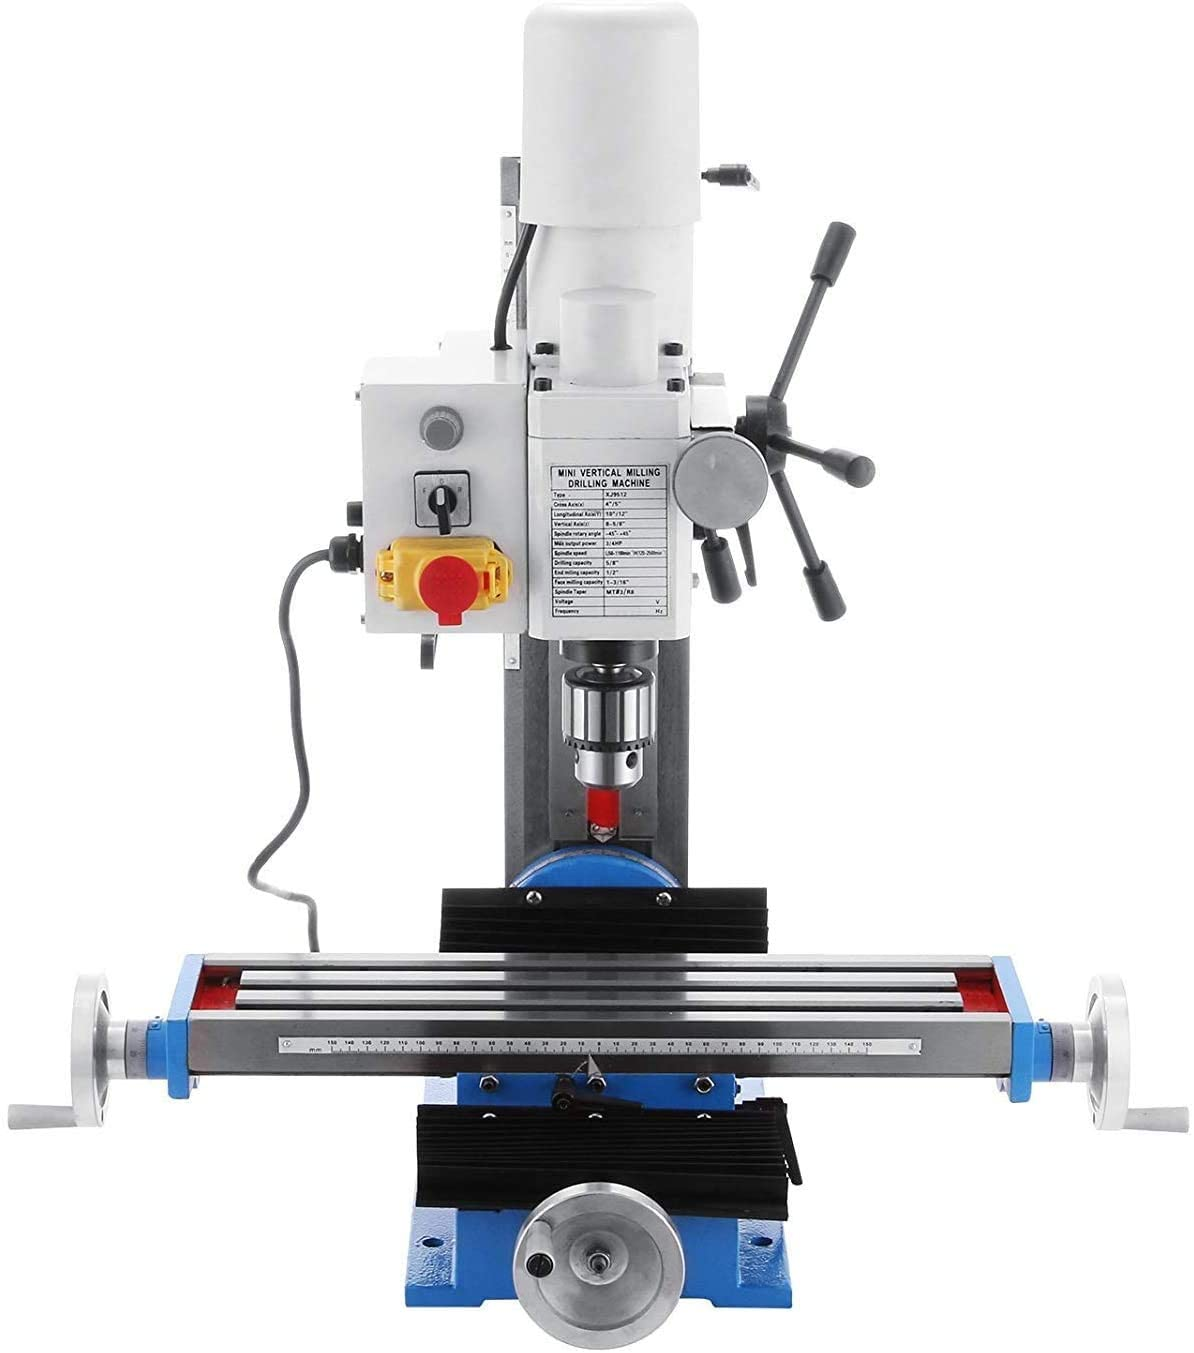 Mophorn Mini Milling Machine